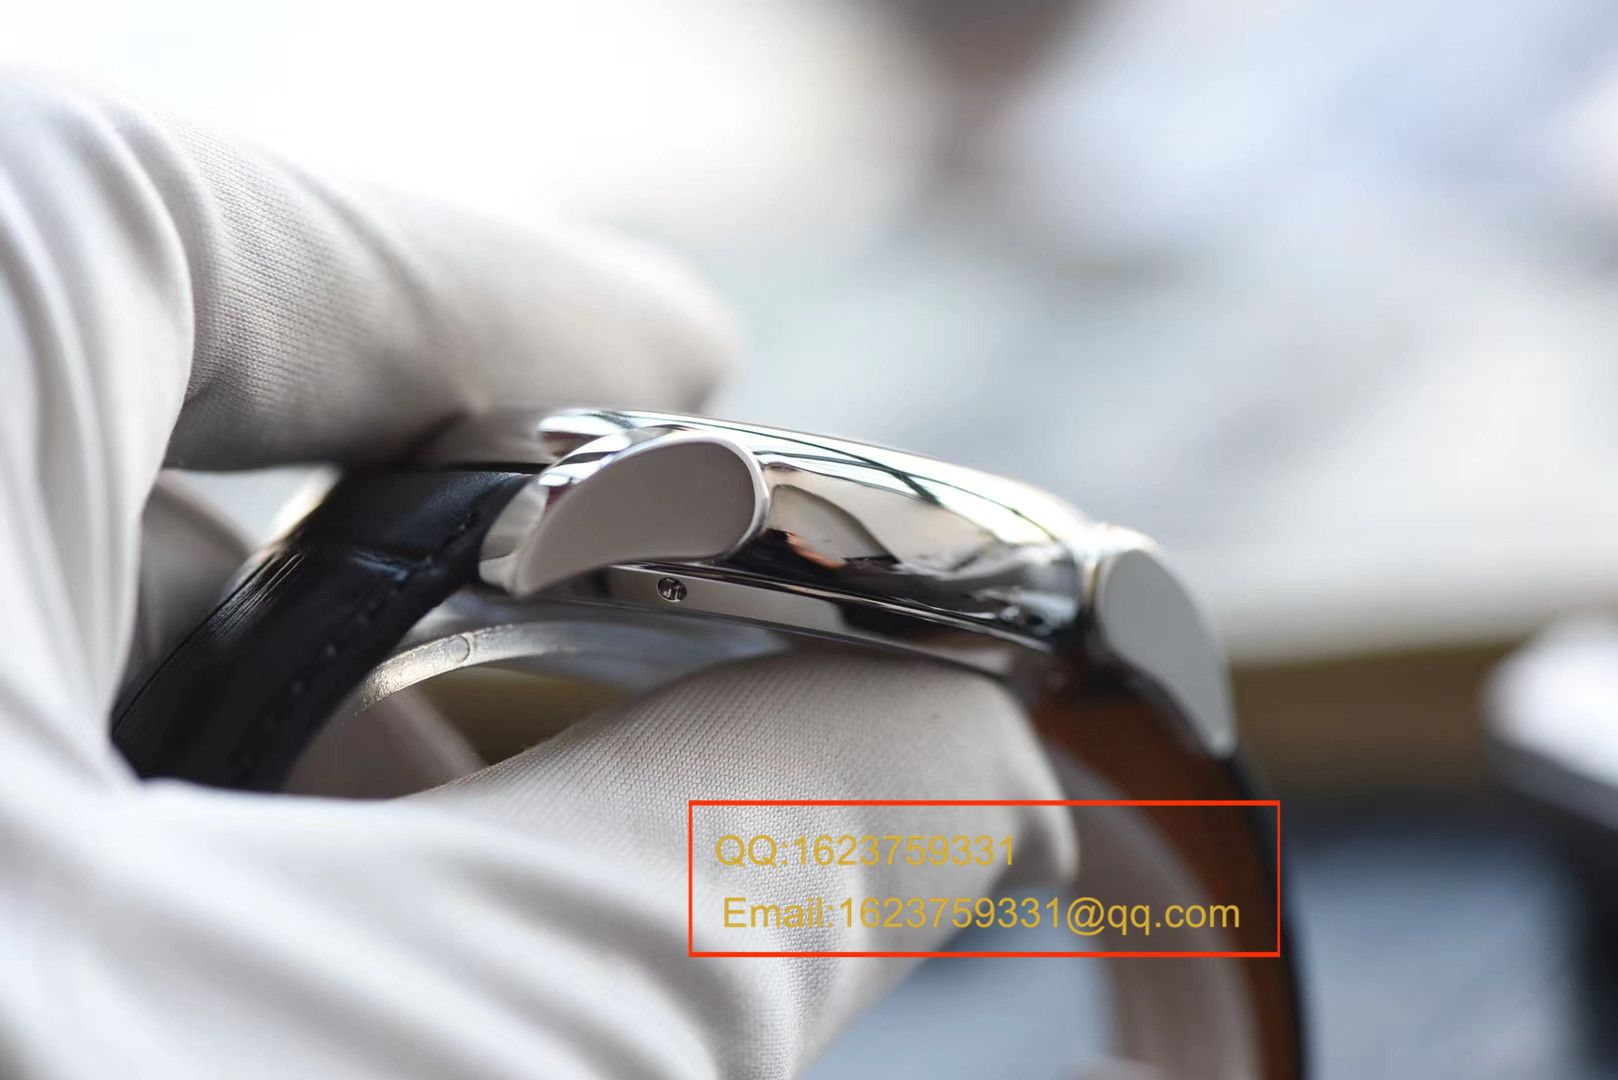 【BM一比一超A高仿手表】帕玛强尼T0URBlLL0N TONDA 42 Y0URBlLL0N系列真飞轮(型号PF600695)  / PMDE016